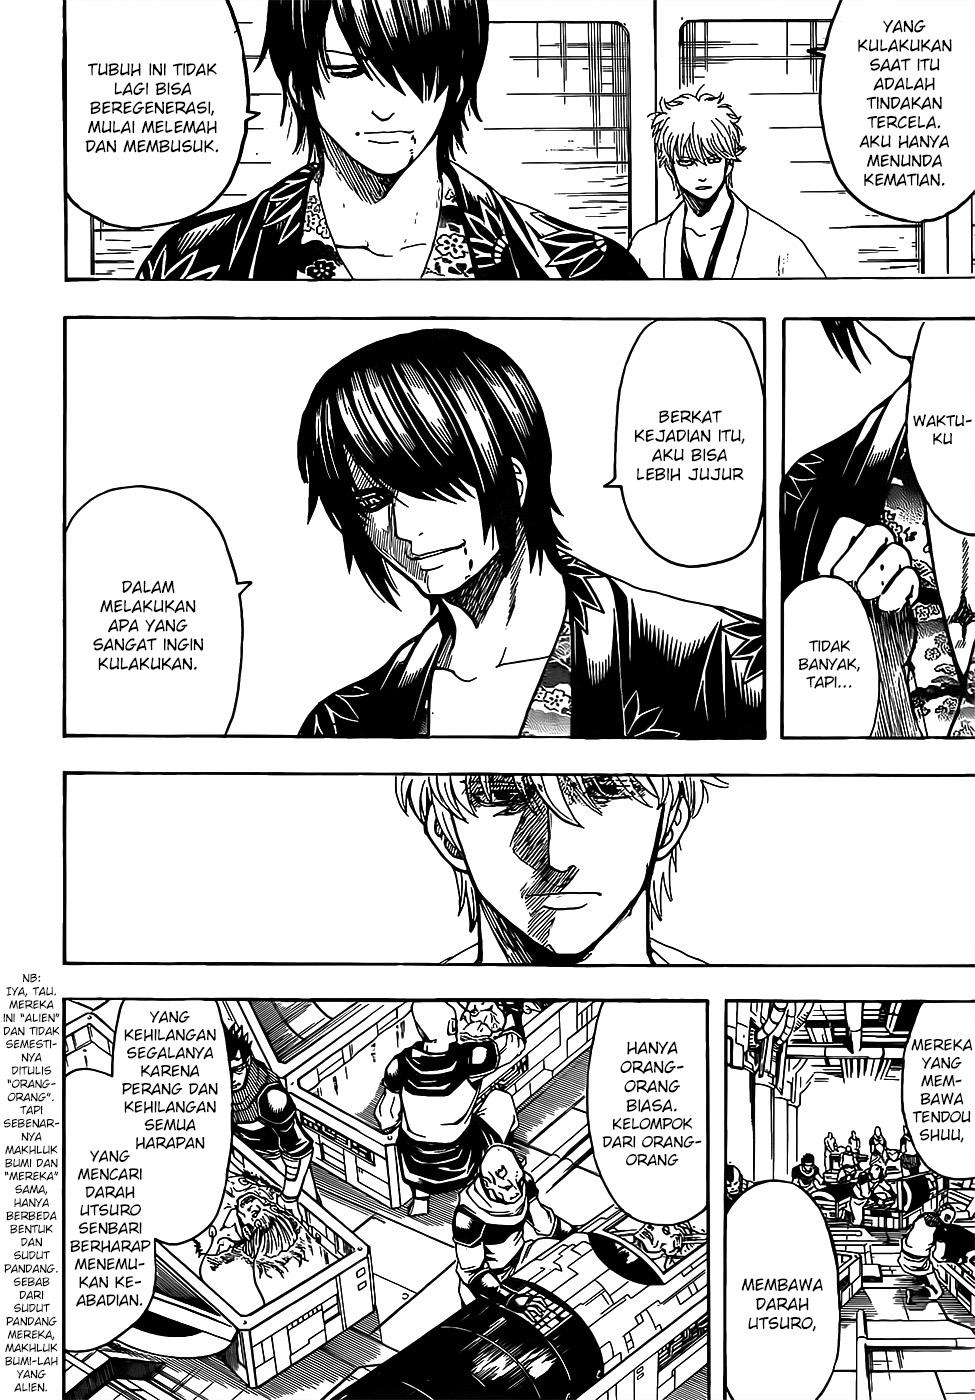 Gintama Chapter 682-6